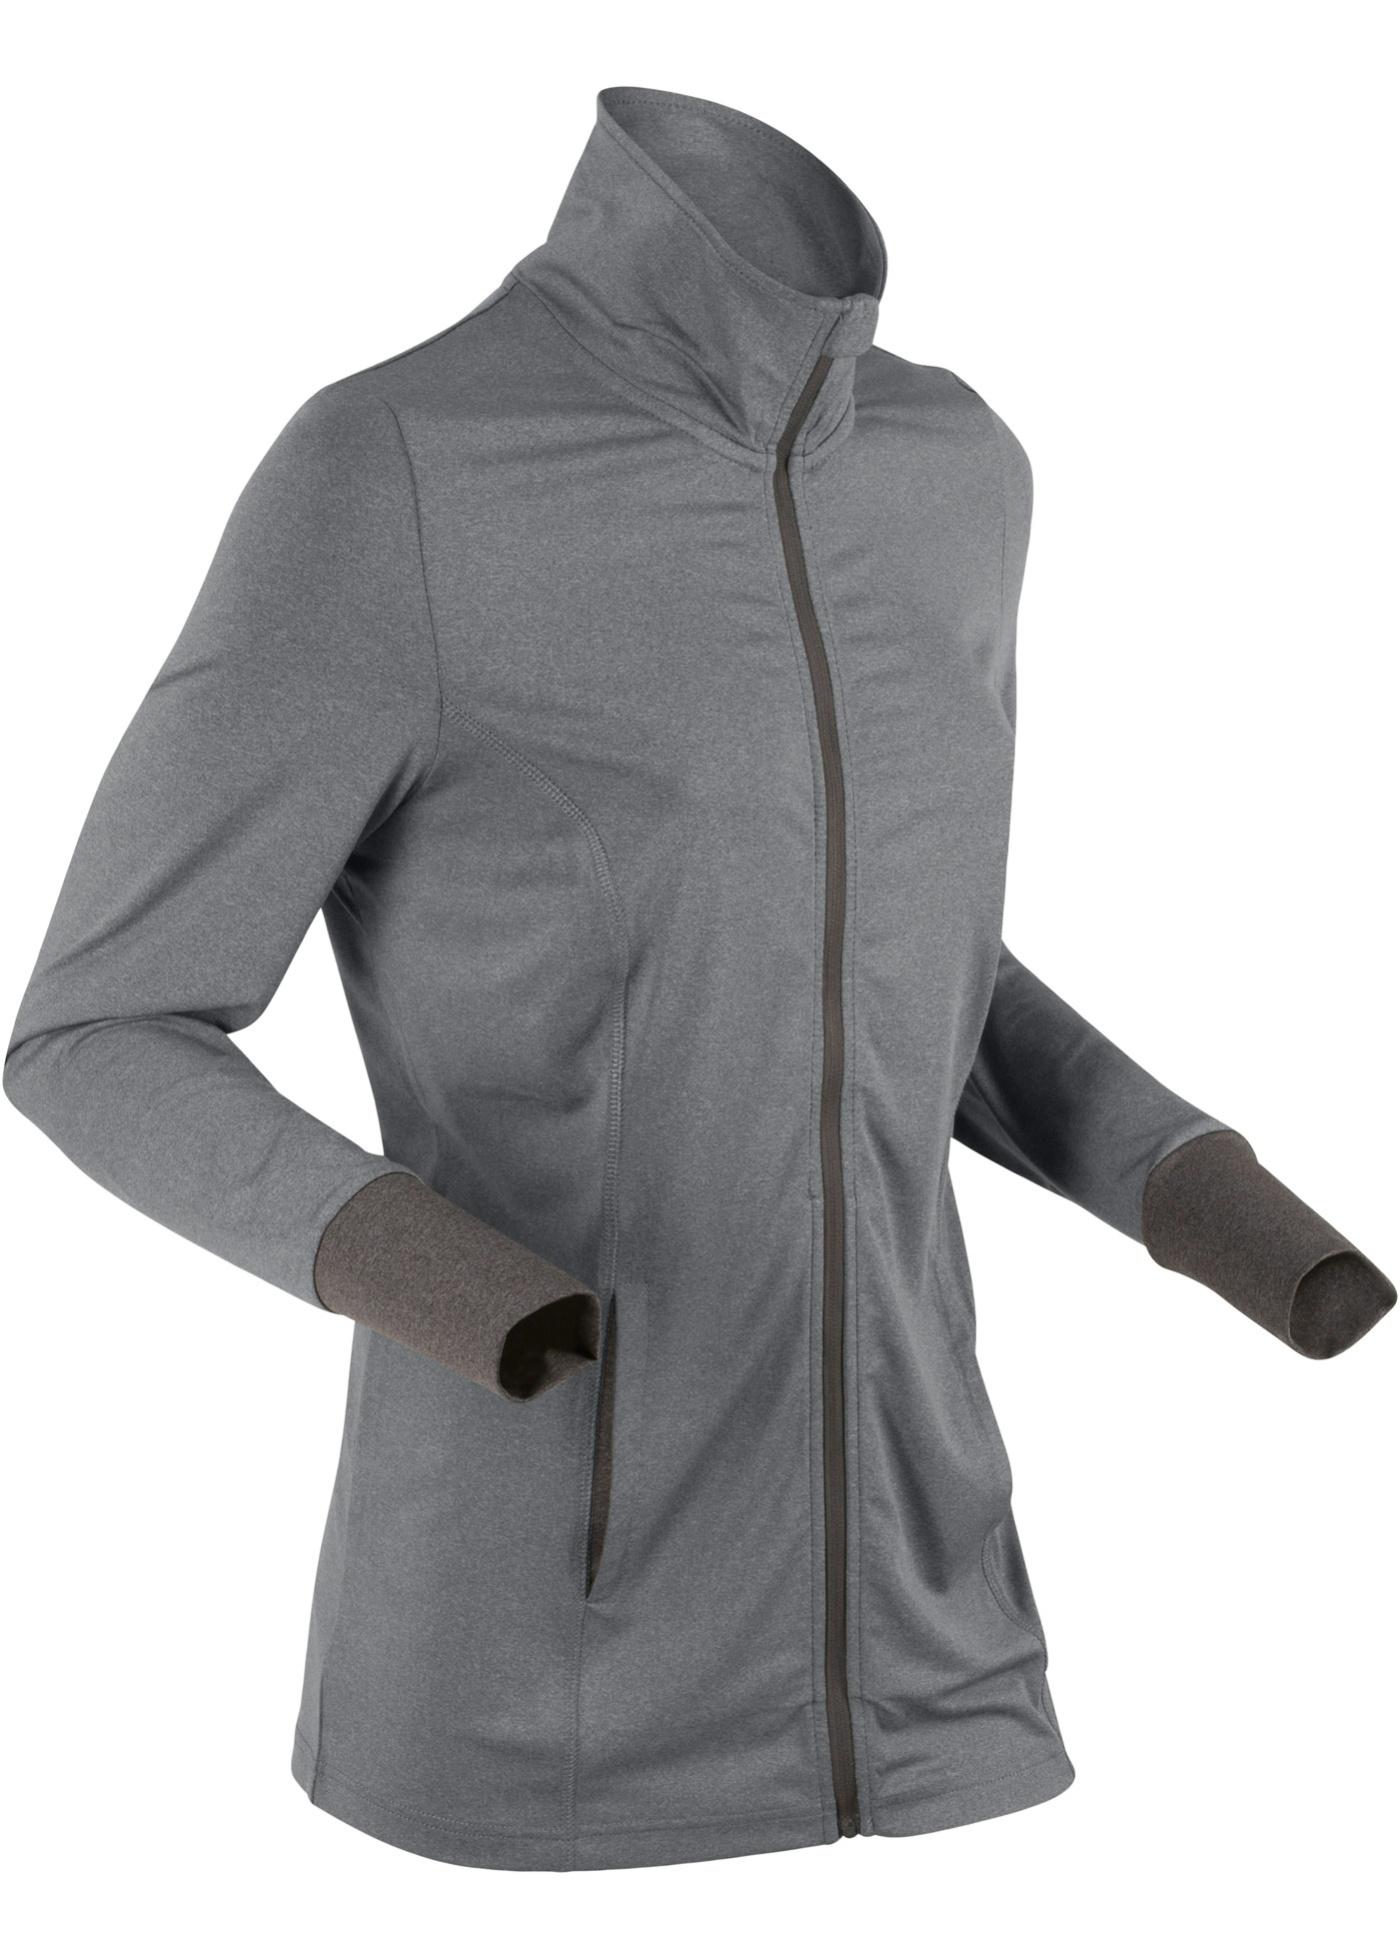 Giacca sportiva in jersey (Grigio) - bpc bonprix collection